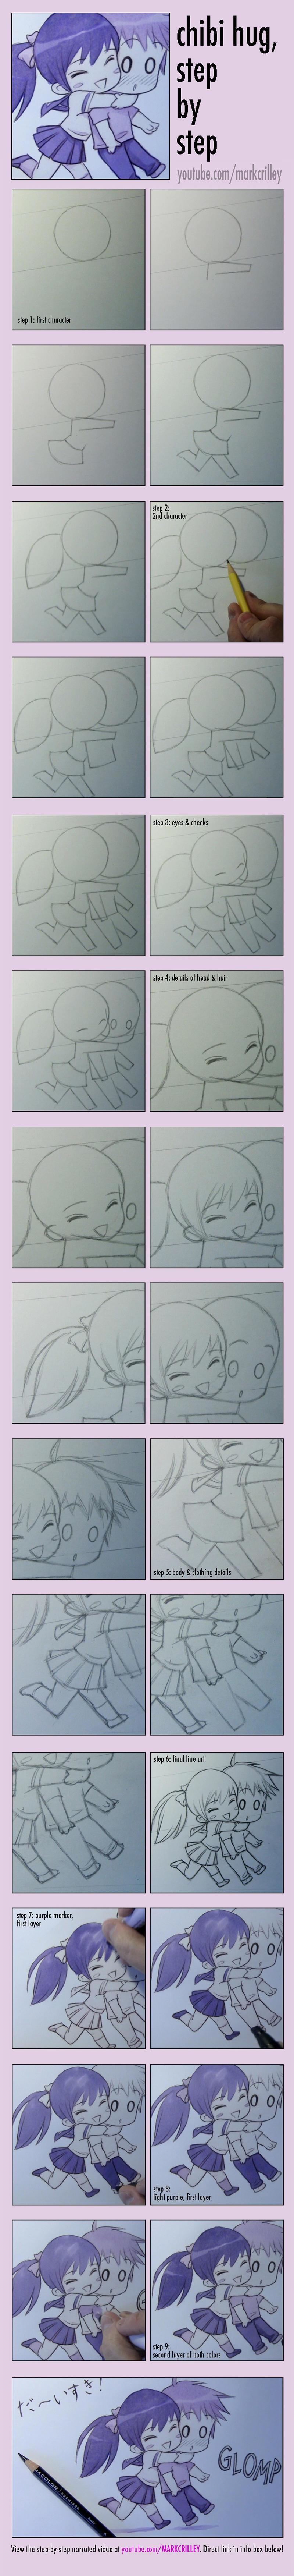 Chibi Hug, Step by Step by markcrilley